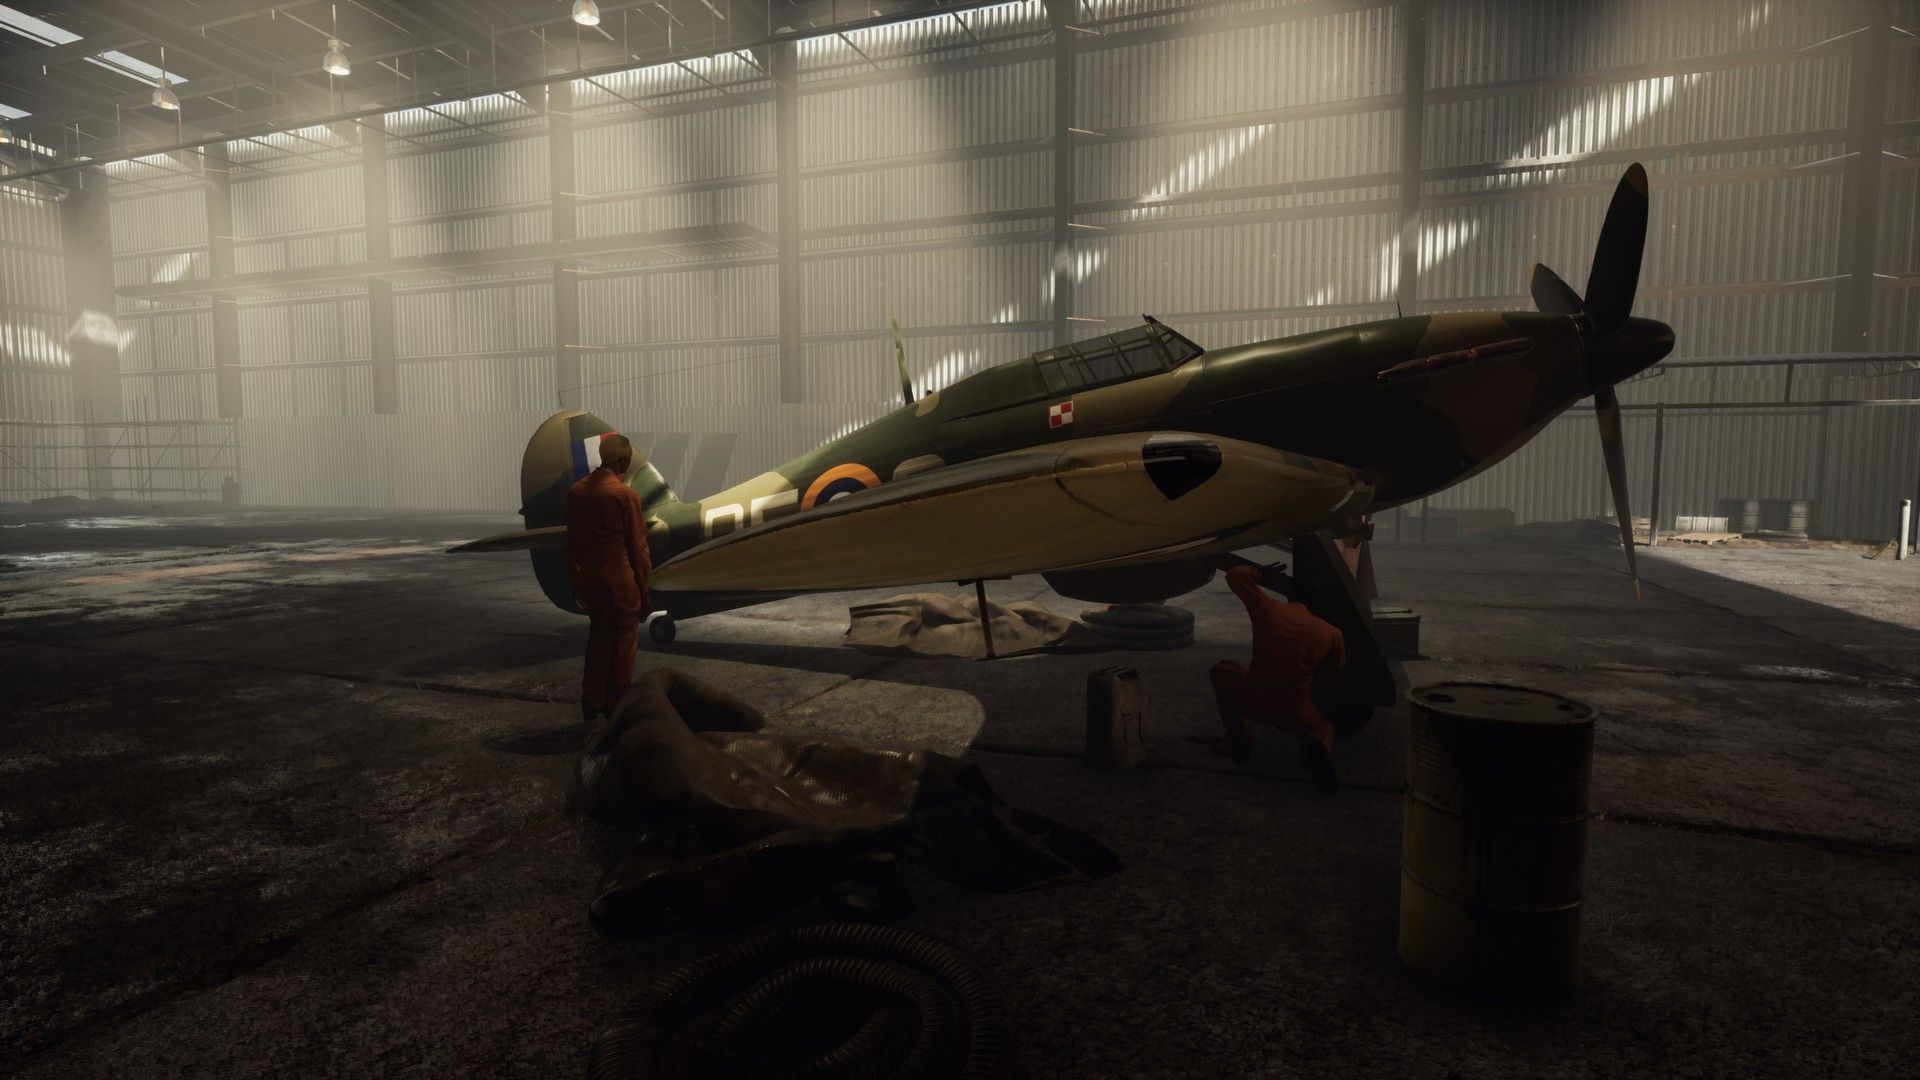 303 Squadron: Battle of Britain (PC)